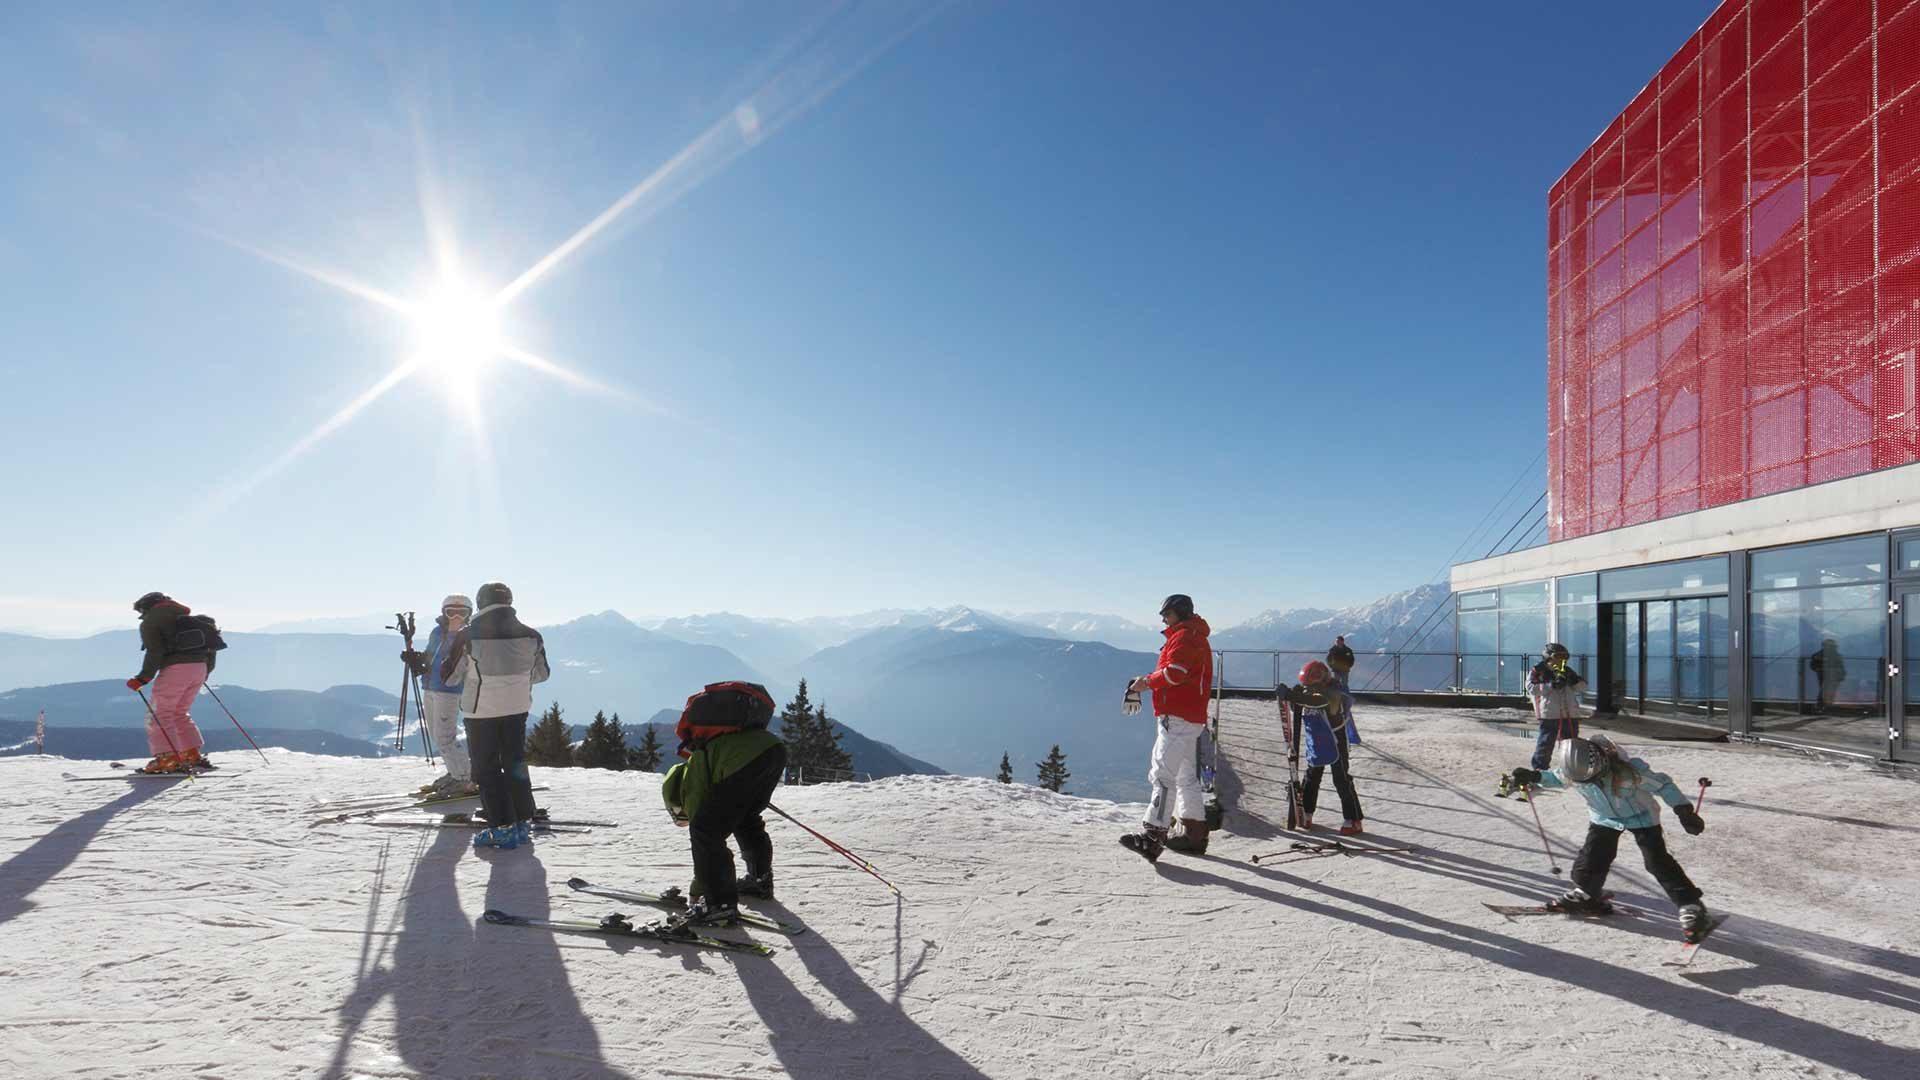 Bergstation - Skigebiet Meran 2000